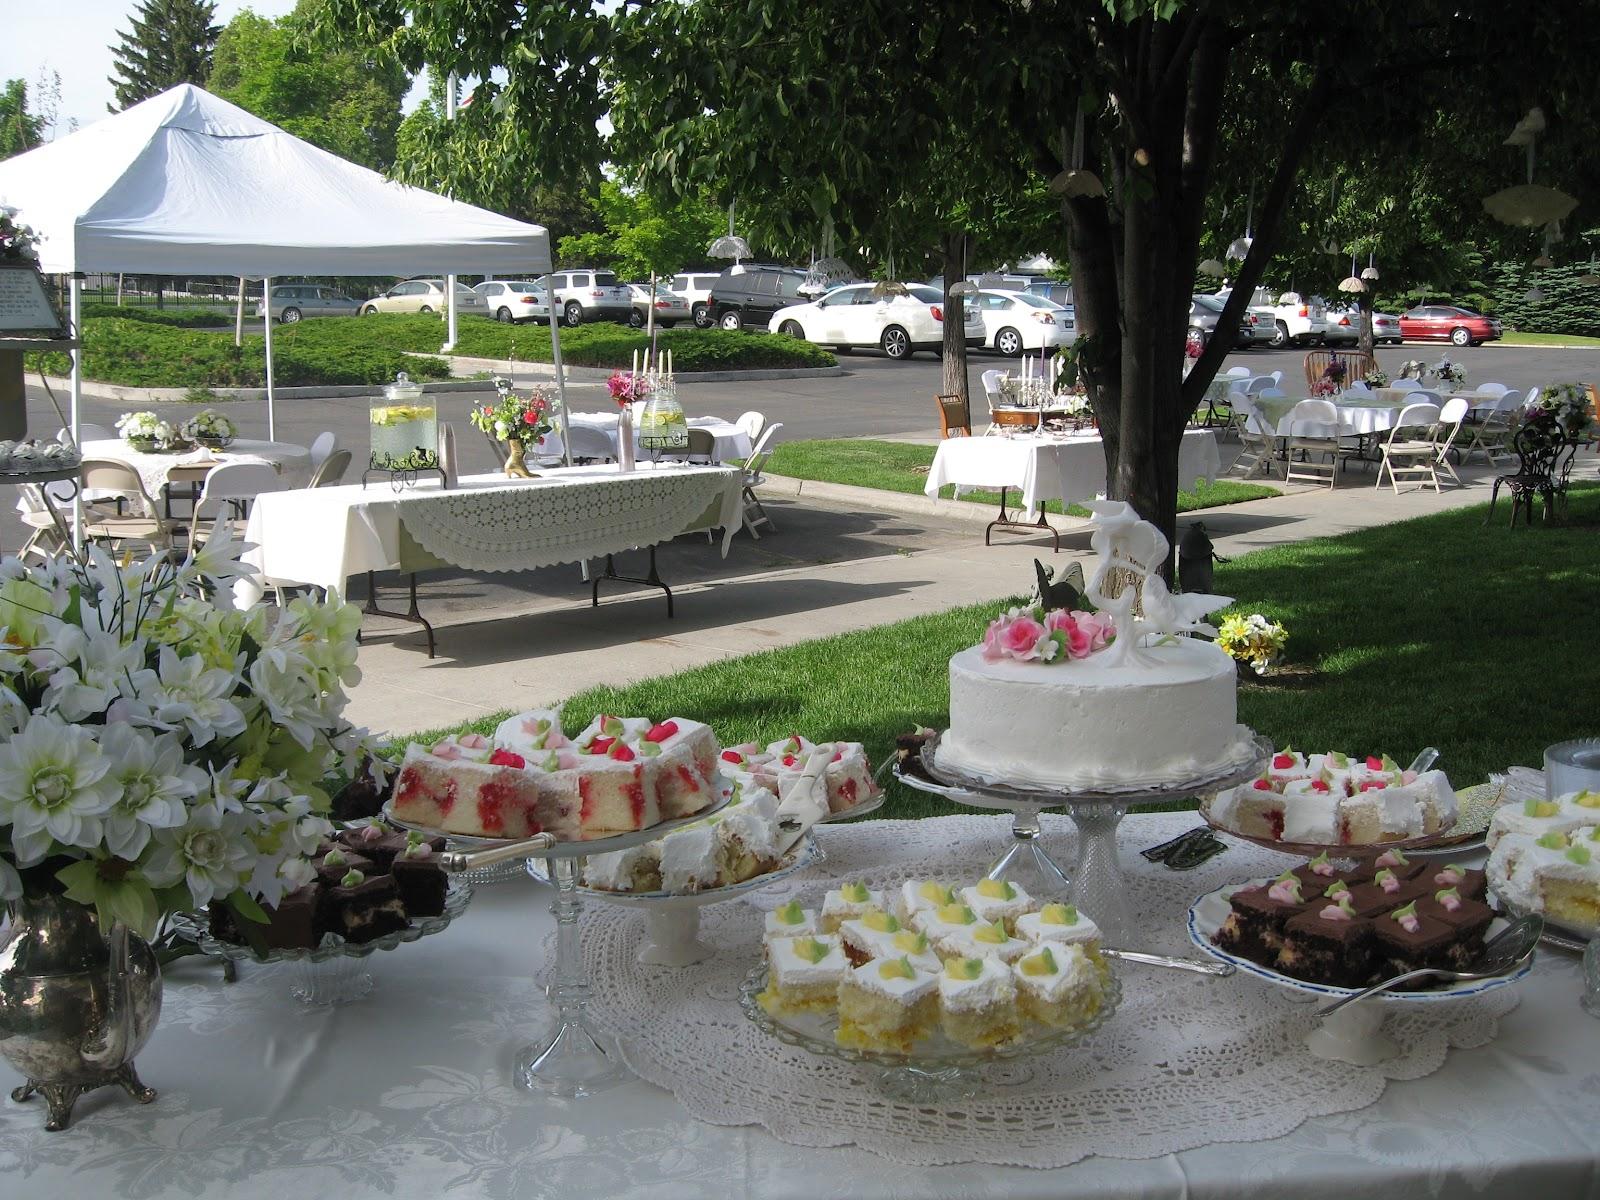 BLURT Blogger: Shabby Chic Wedding Reception On The Cheap